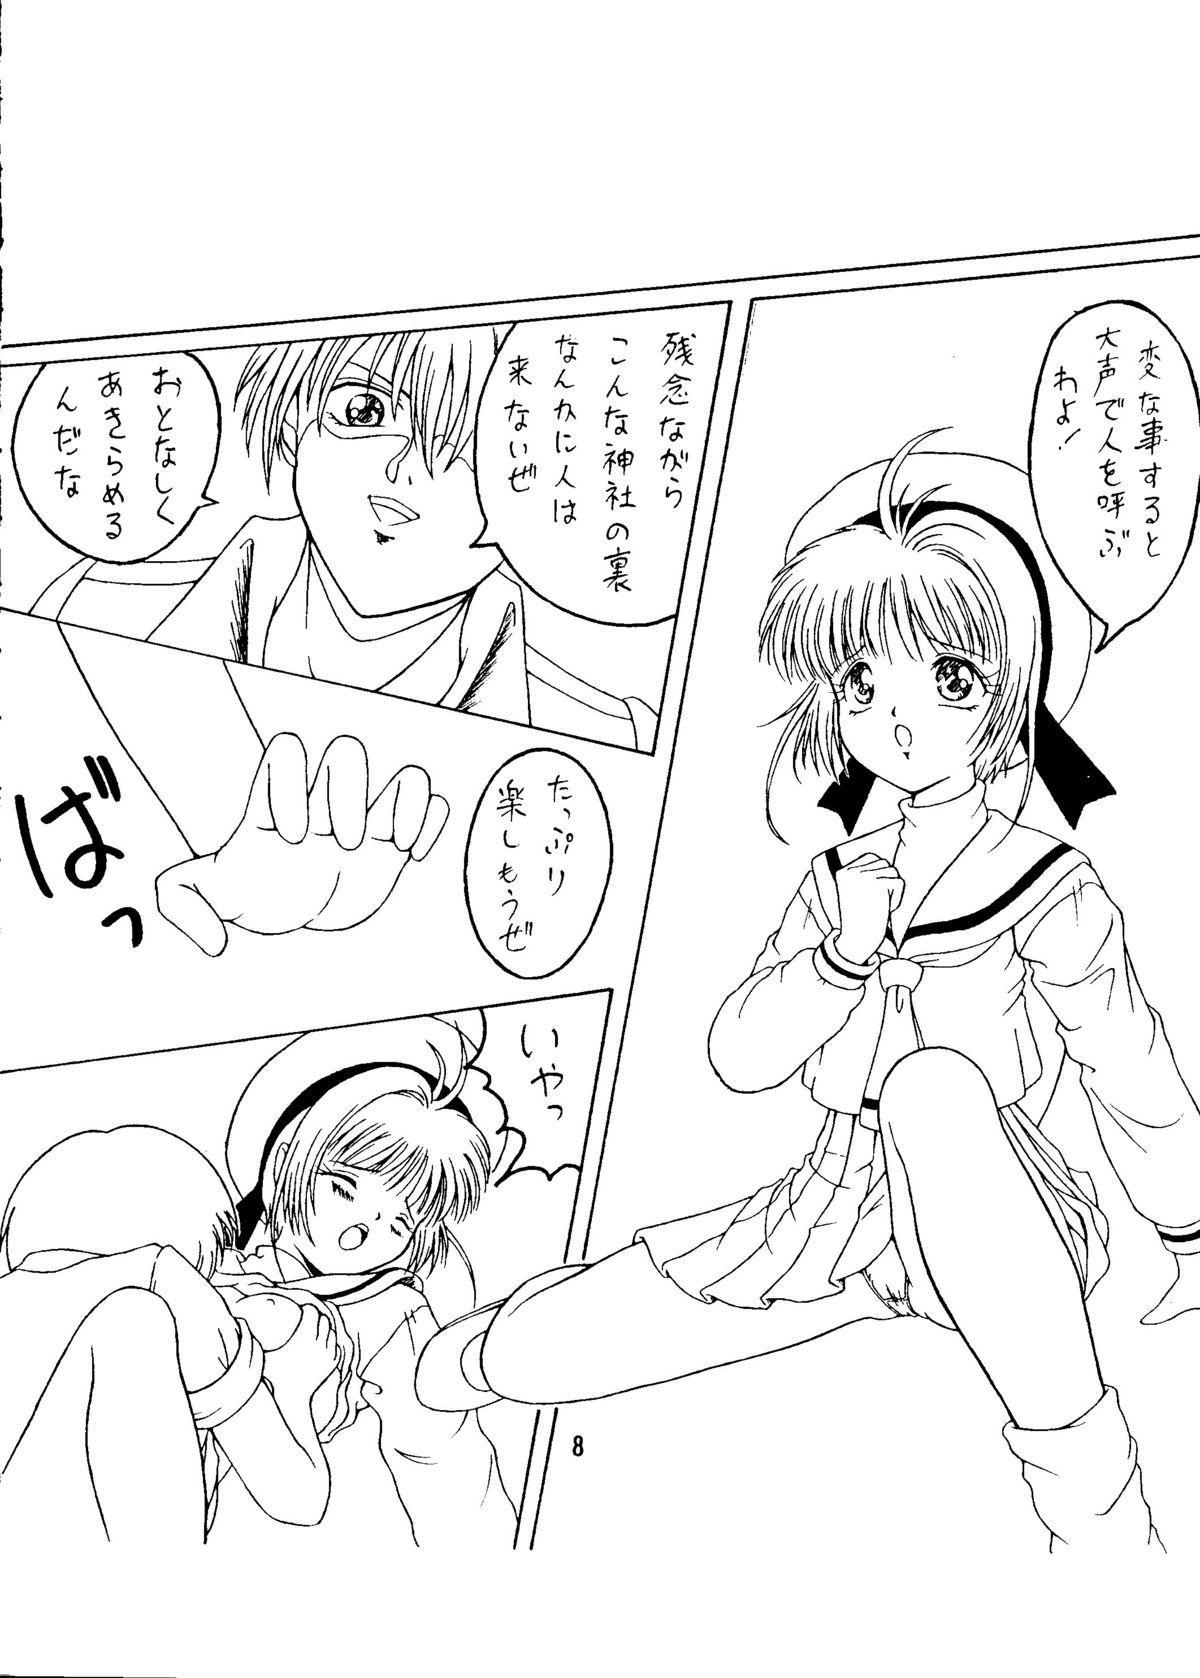 Dandyism 4 (To Heart, Card Captor Sakura, White Album] 9